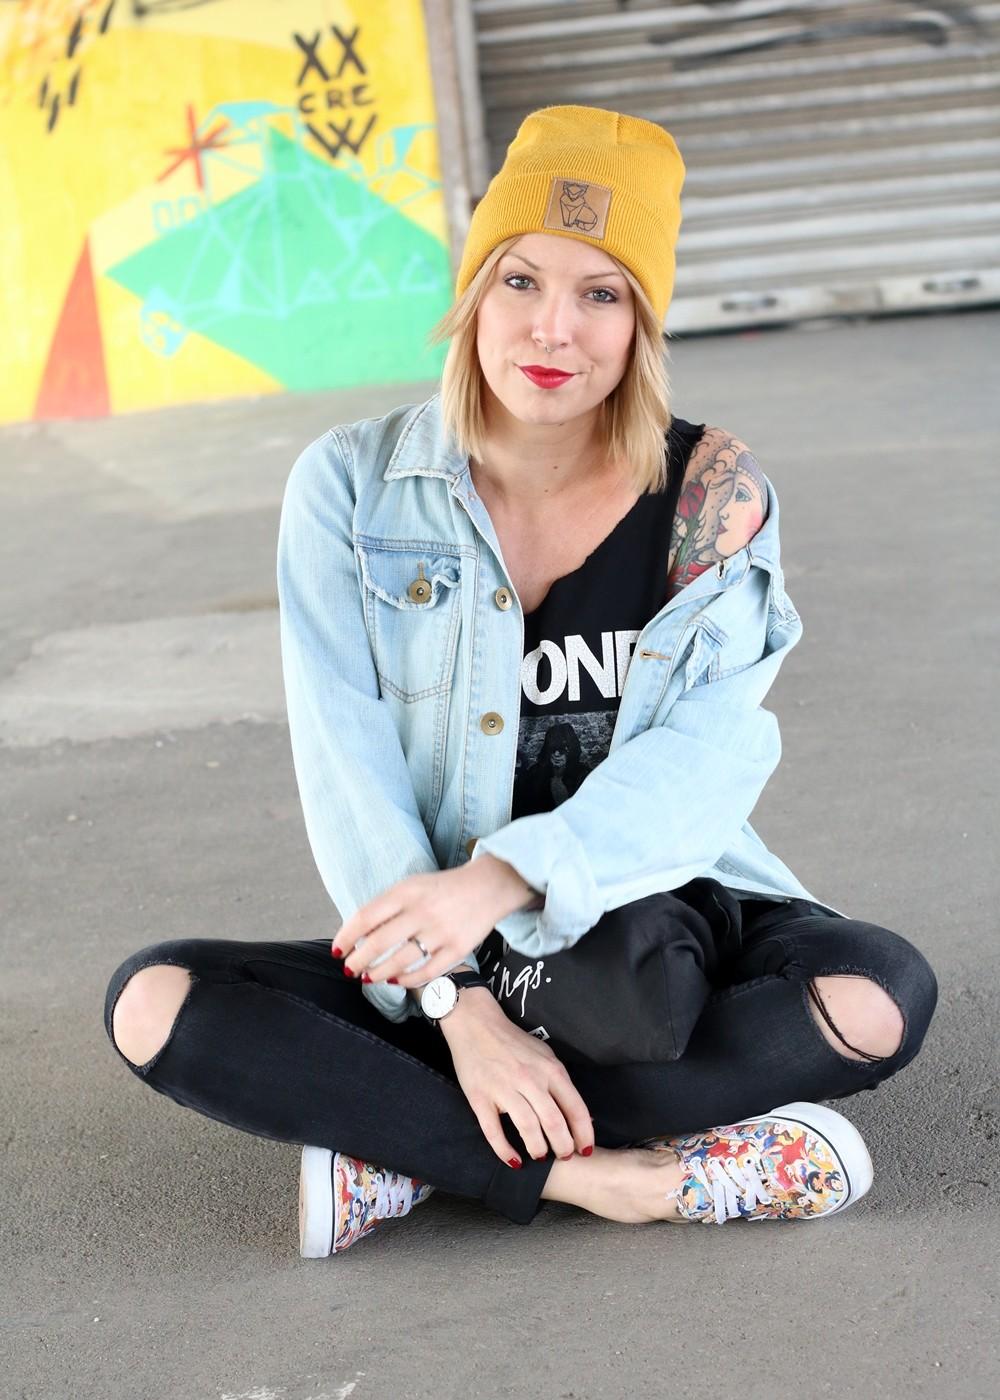 Fahionblogger Outfit Vans Disney Jeansjacke Beanie Fuchs Weebit (9)